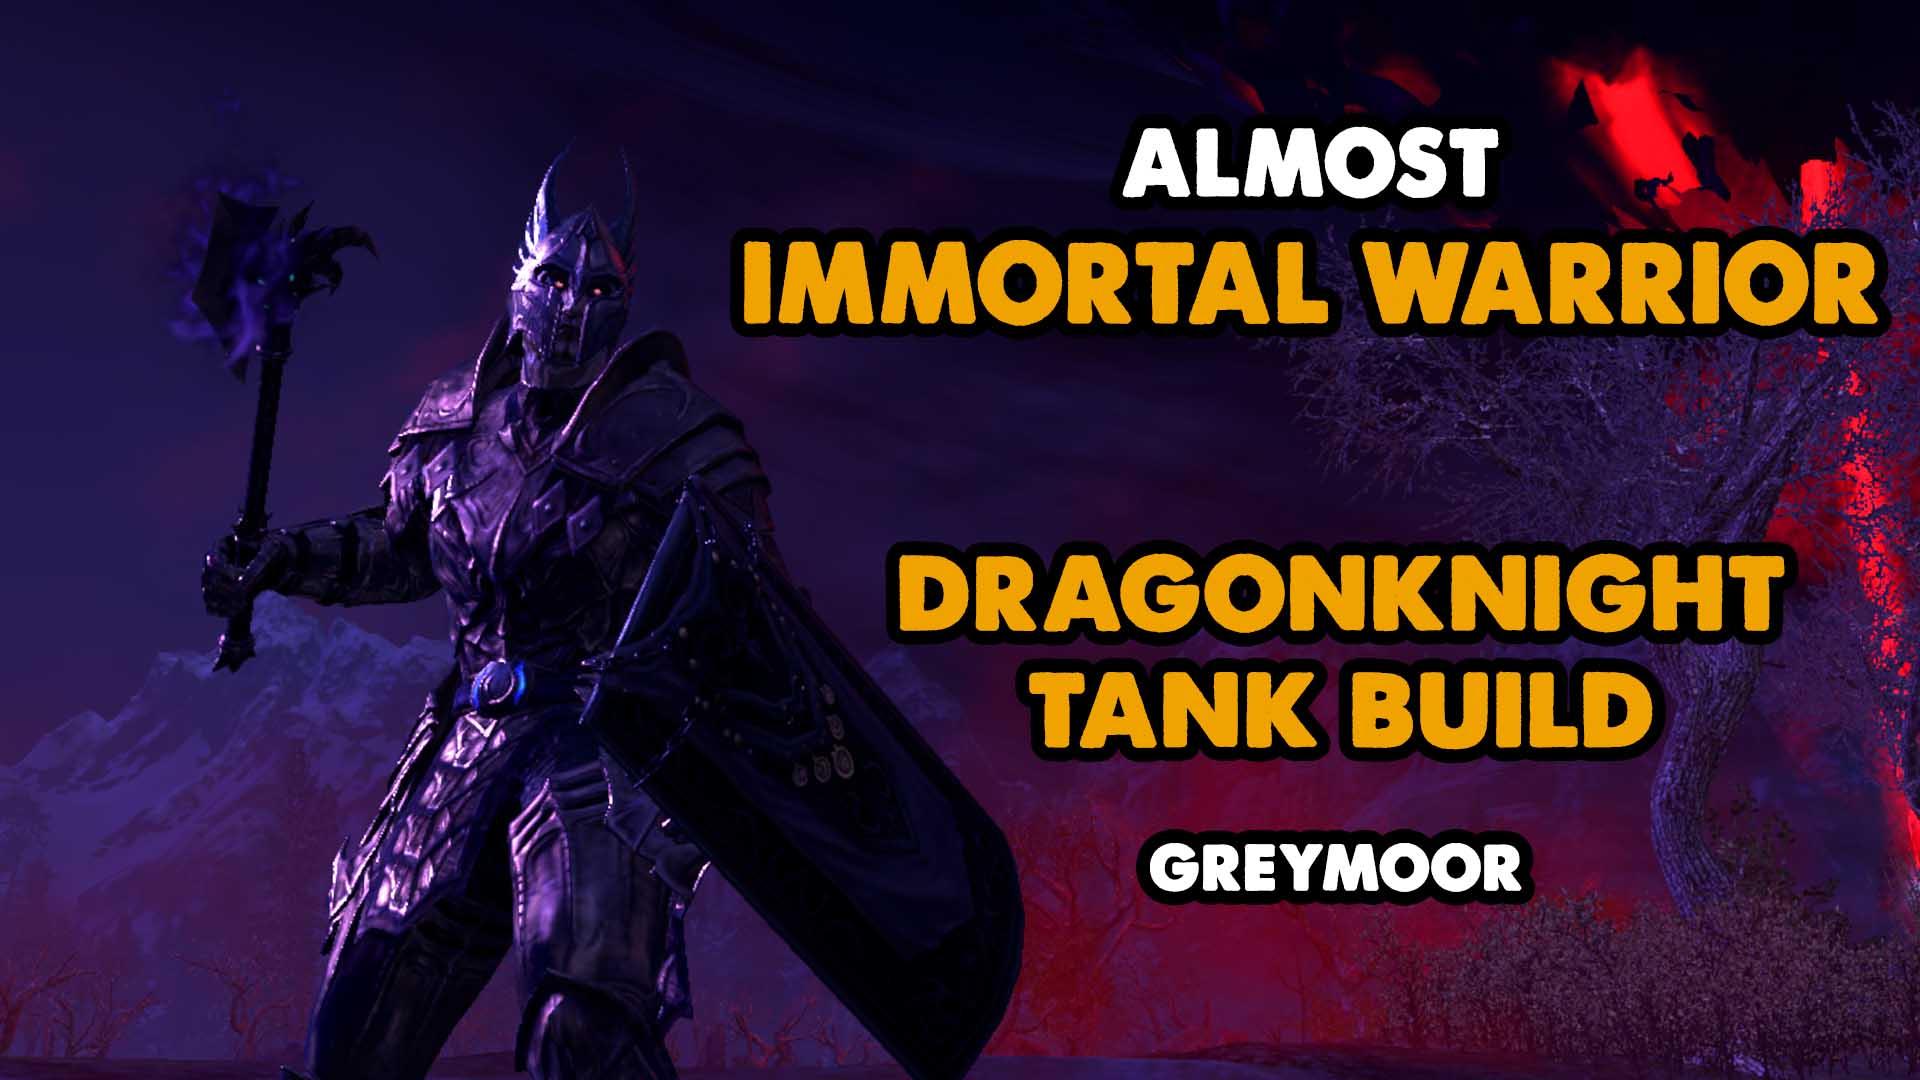 dragonknight, tank, greymoor, skyrim